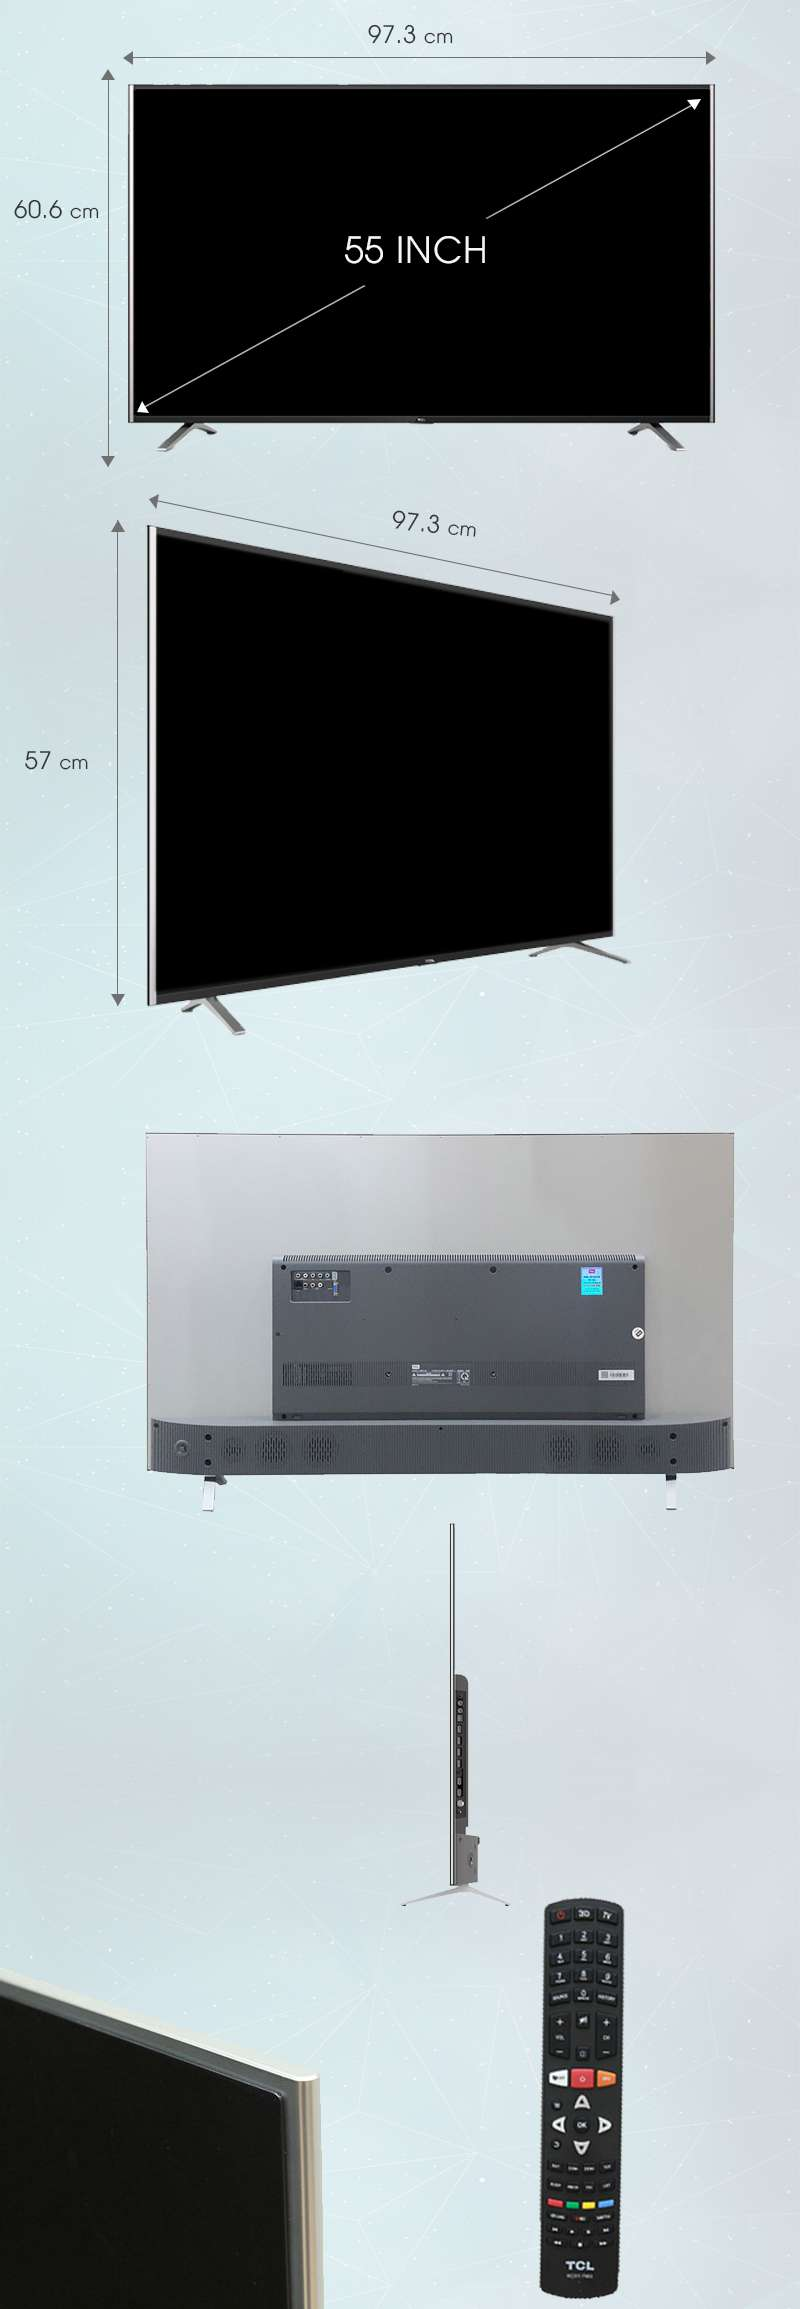 Smart Tivi TCL 55 inch L55C1-UF